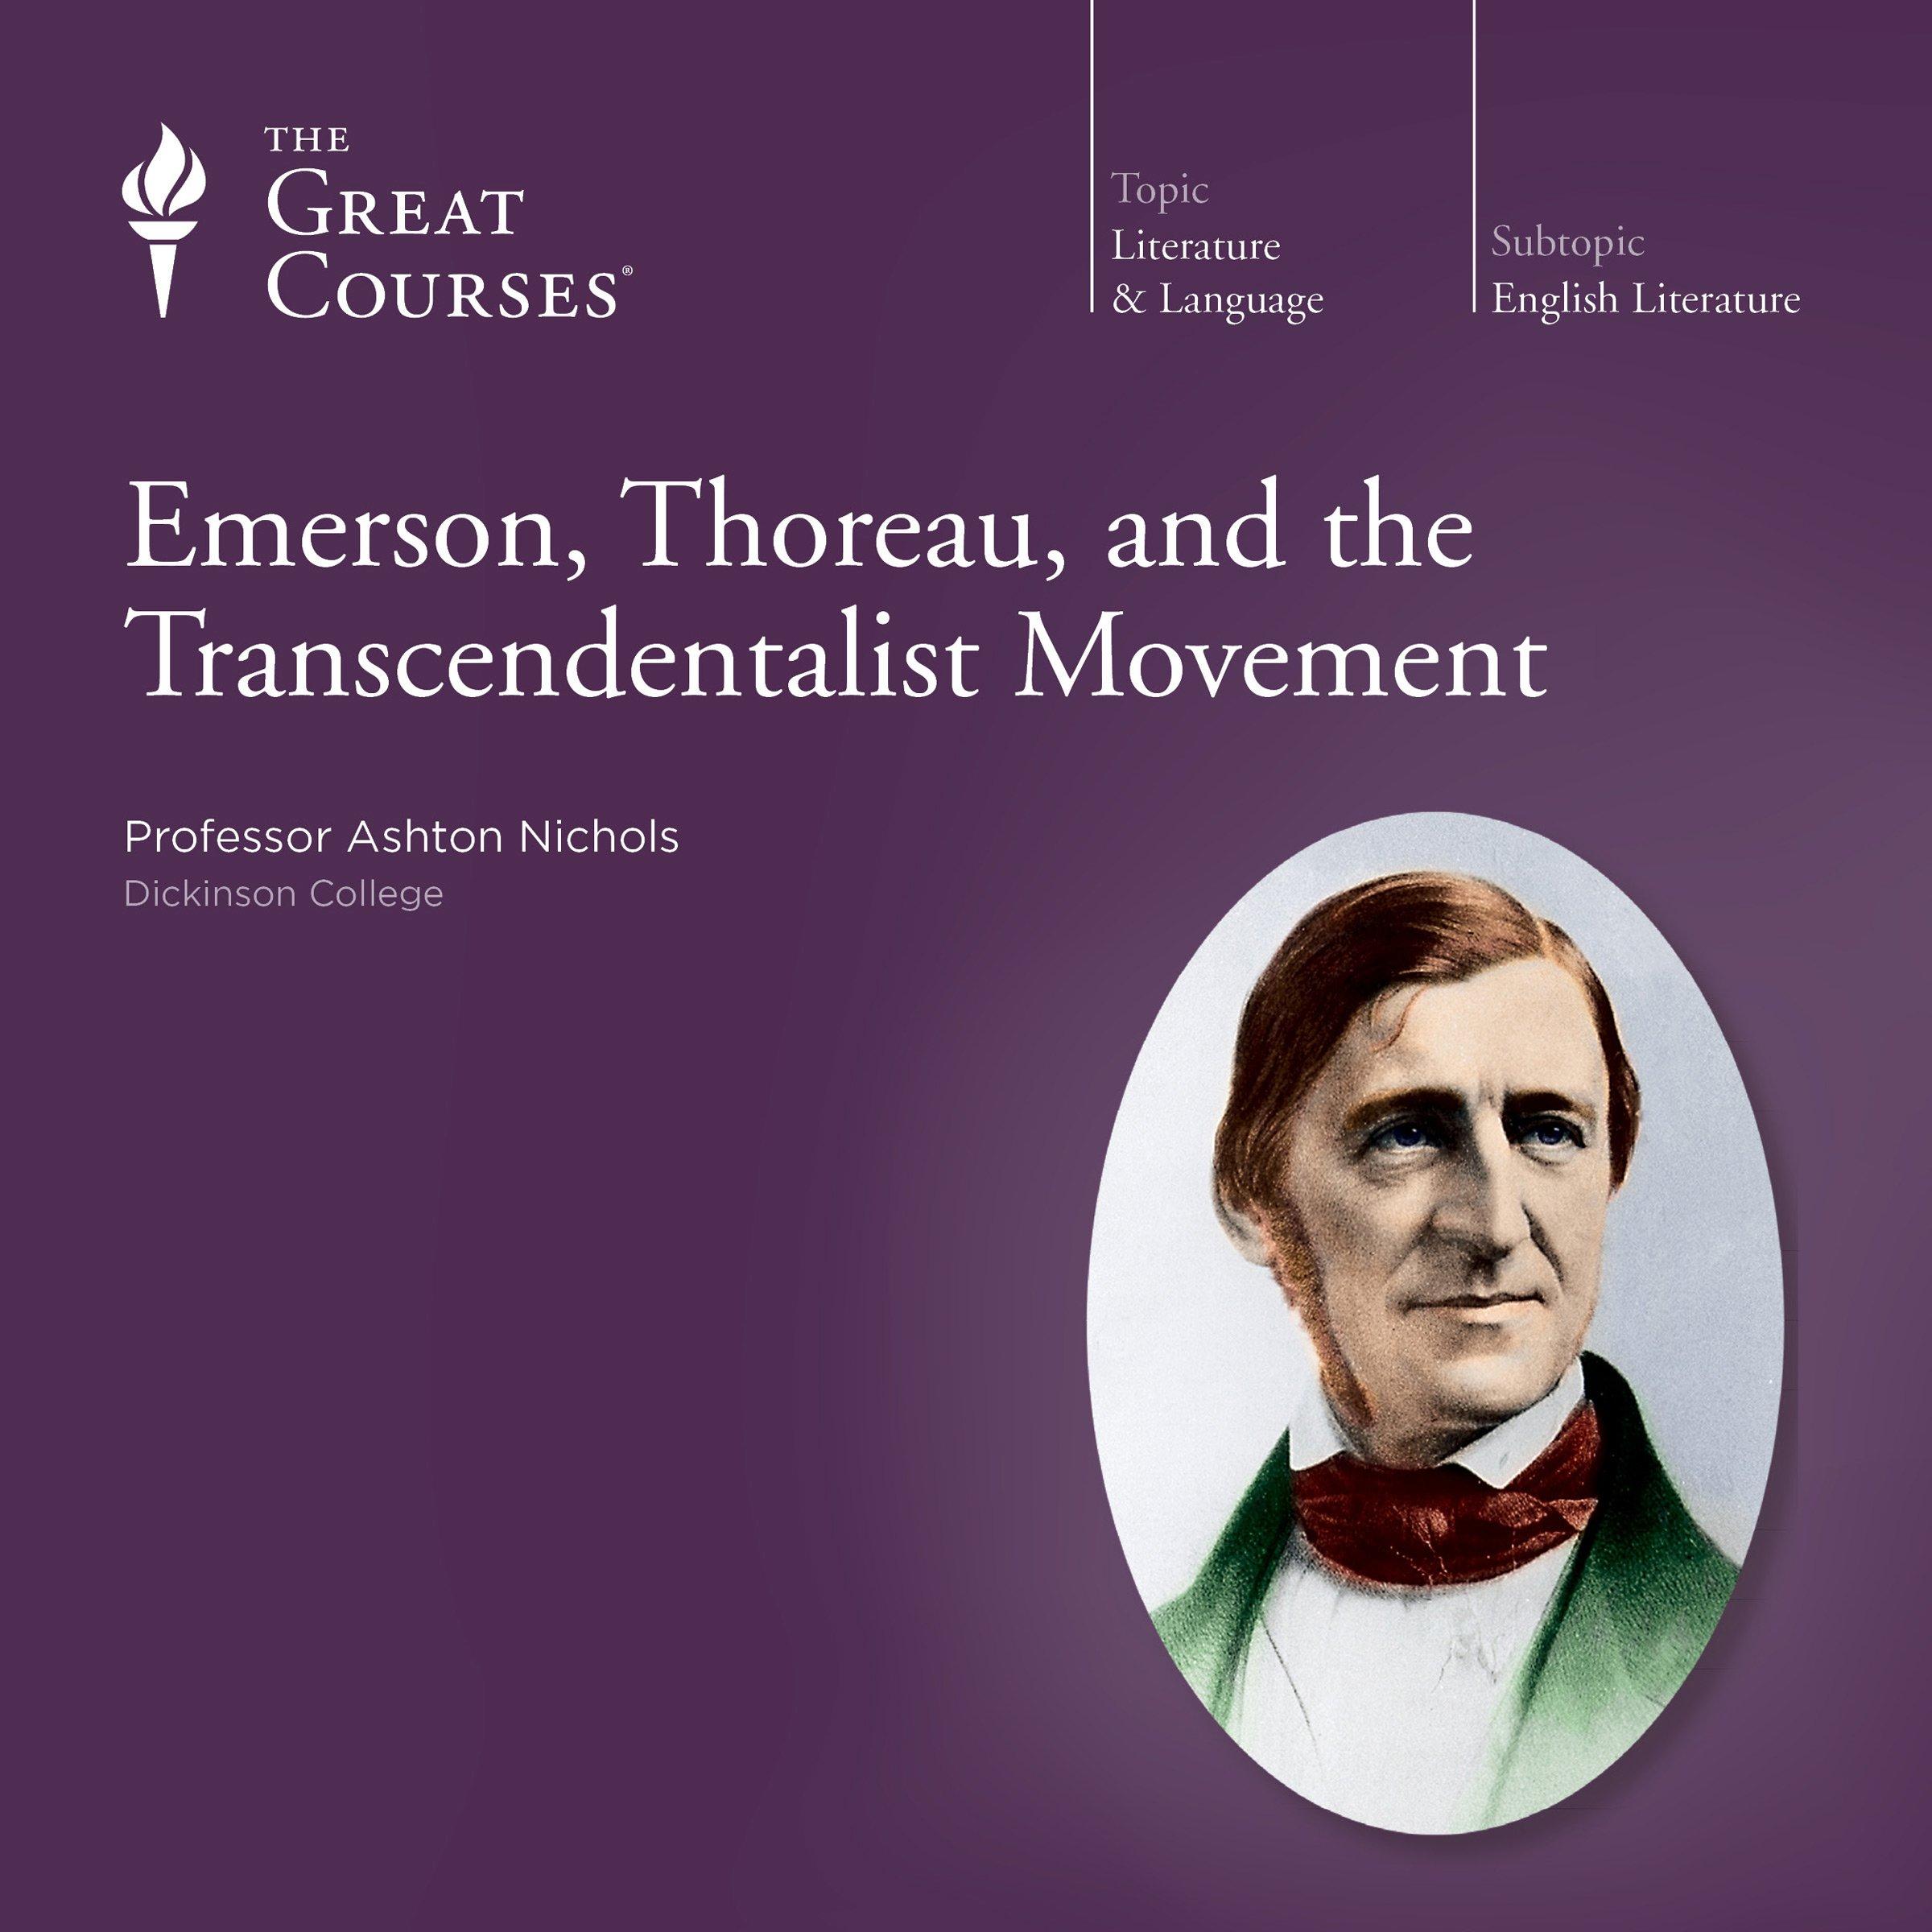 Emerson, Thoreau, and the Transcendentalist Movement